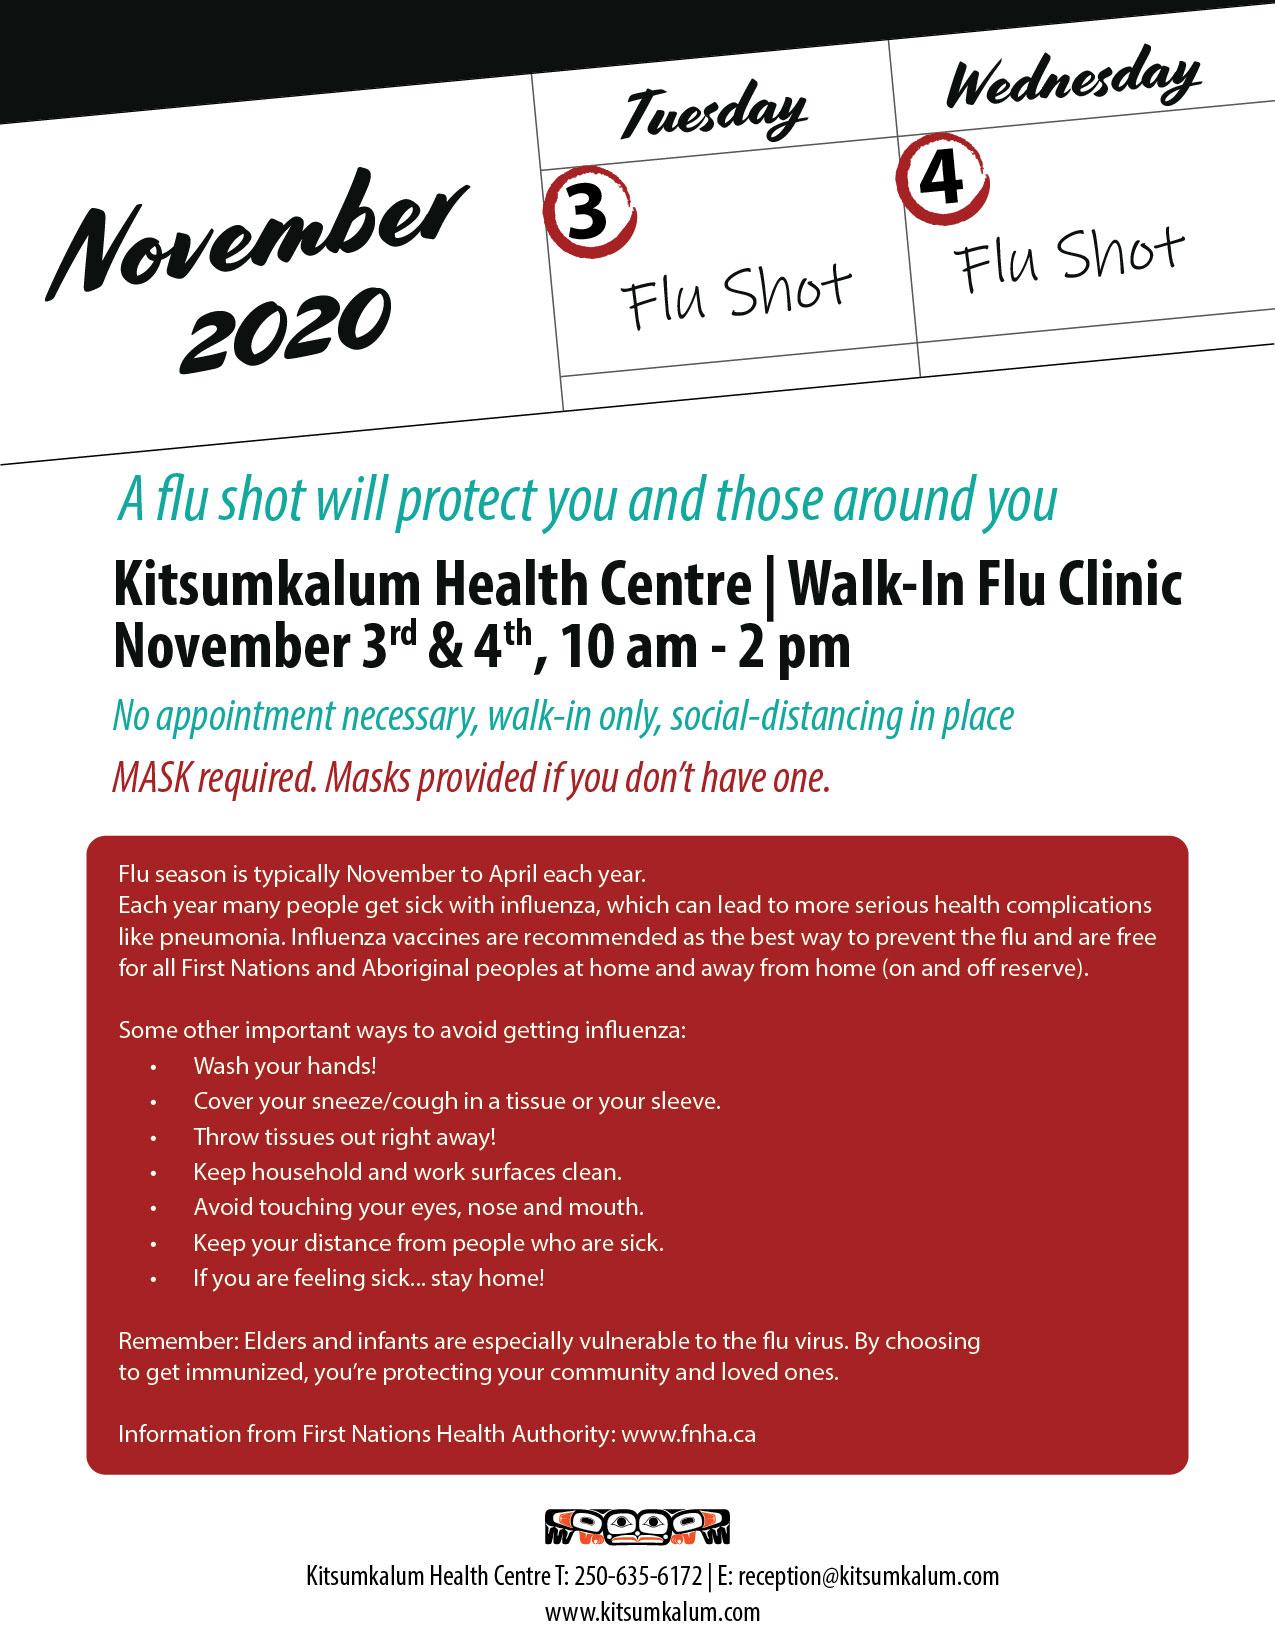 Kitsumkalum Health Flu Clinics NOV 3rd and 4th